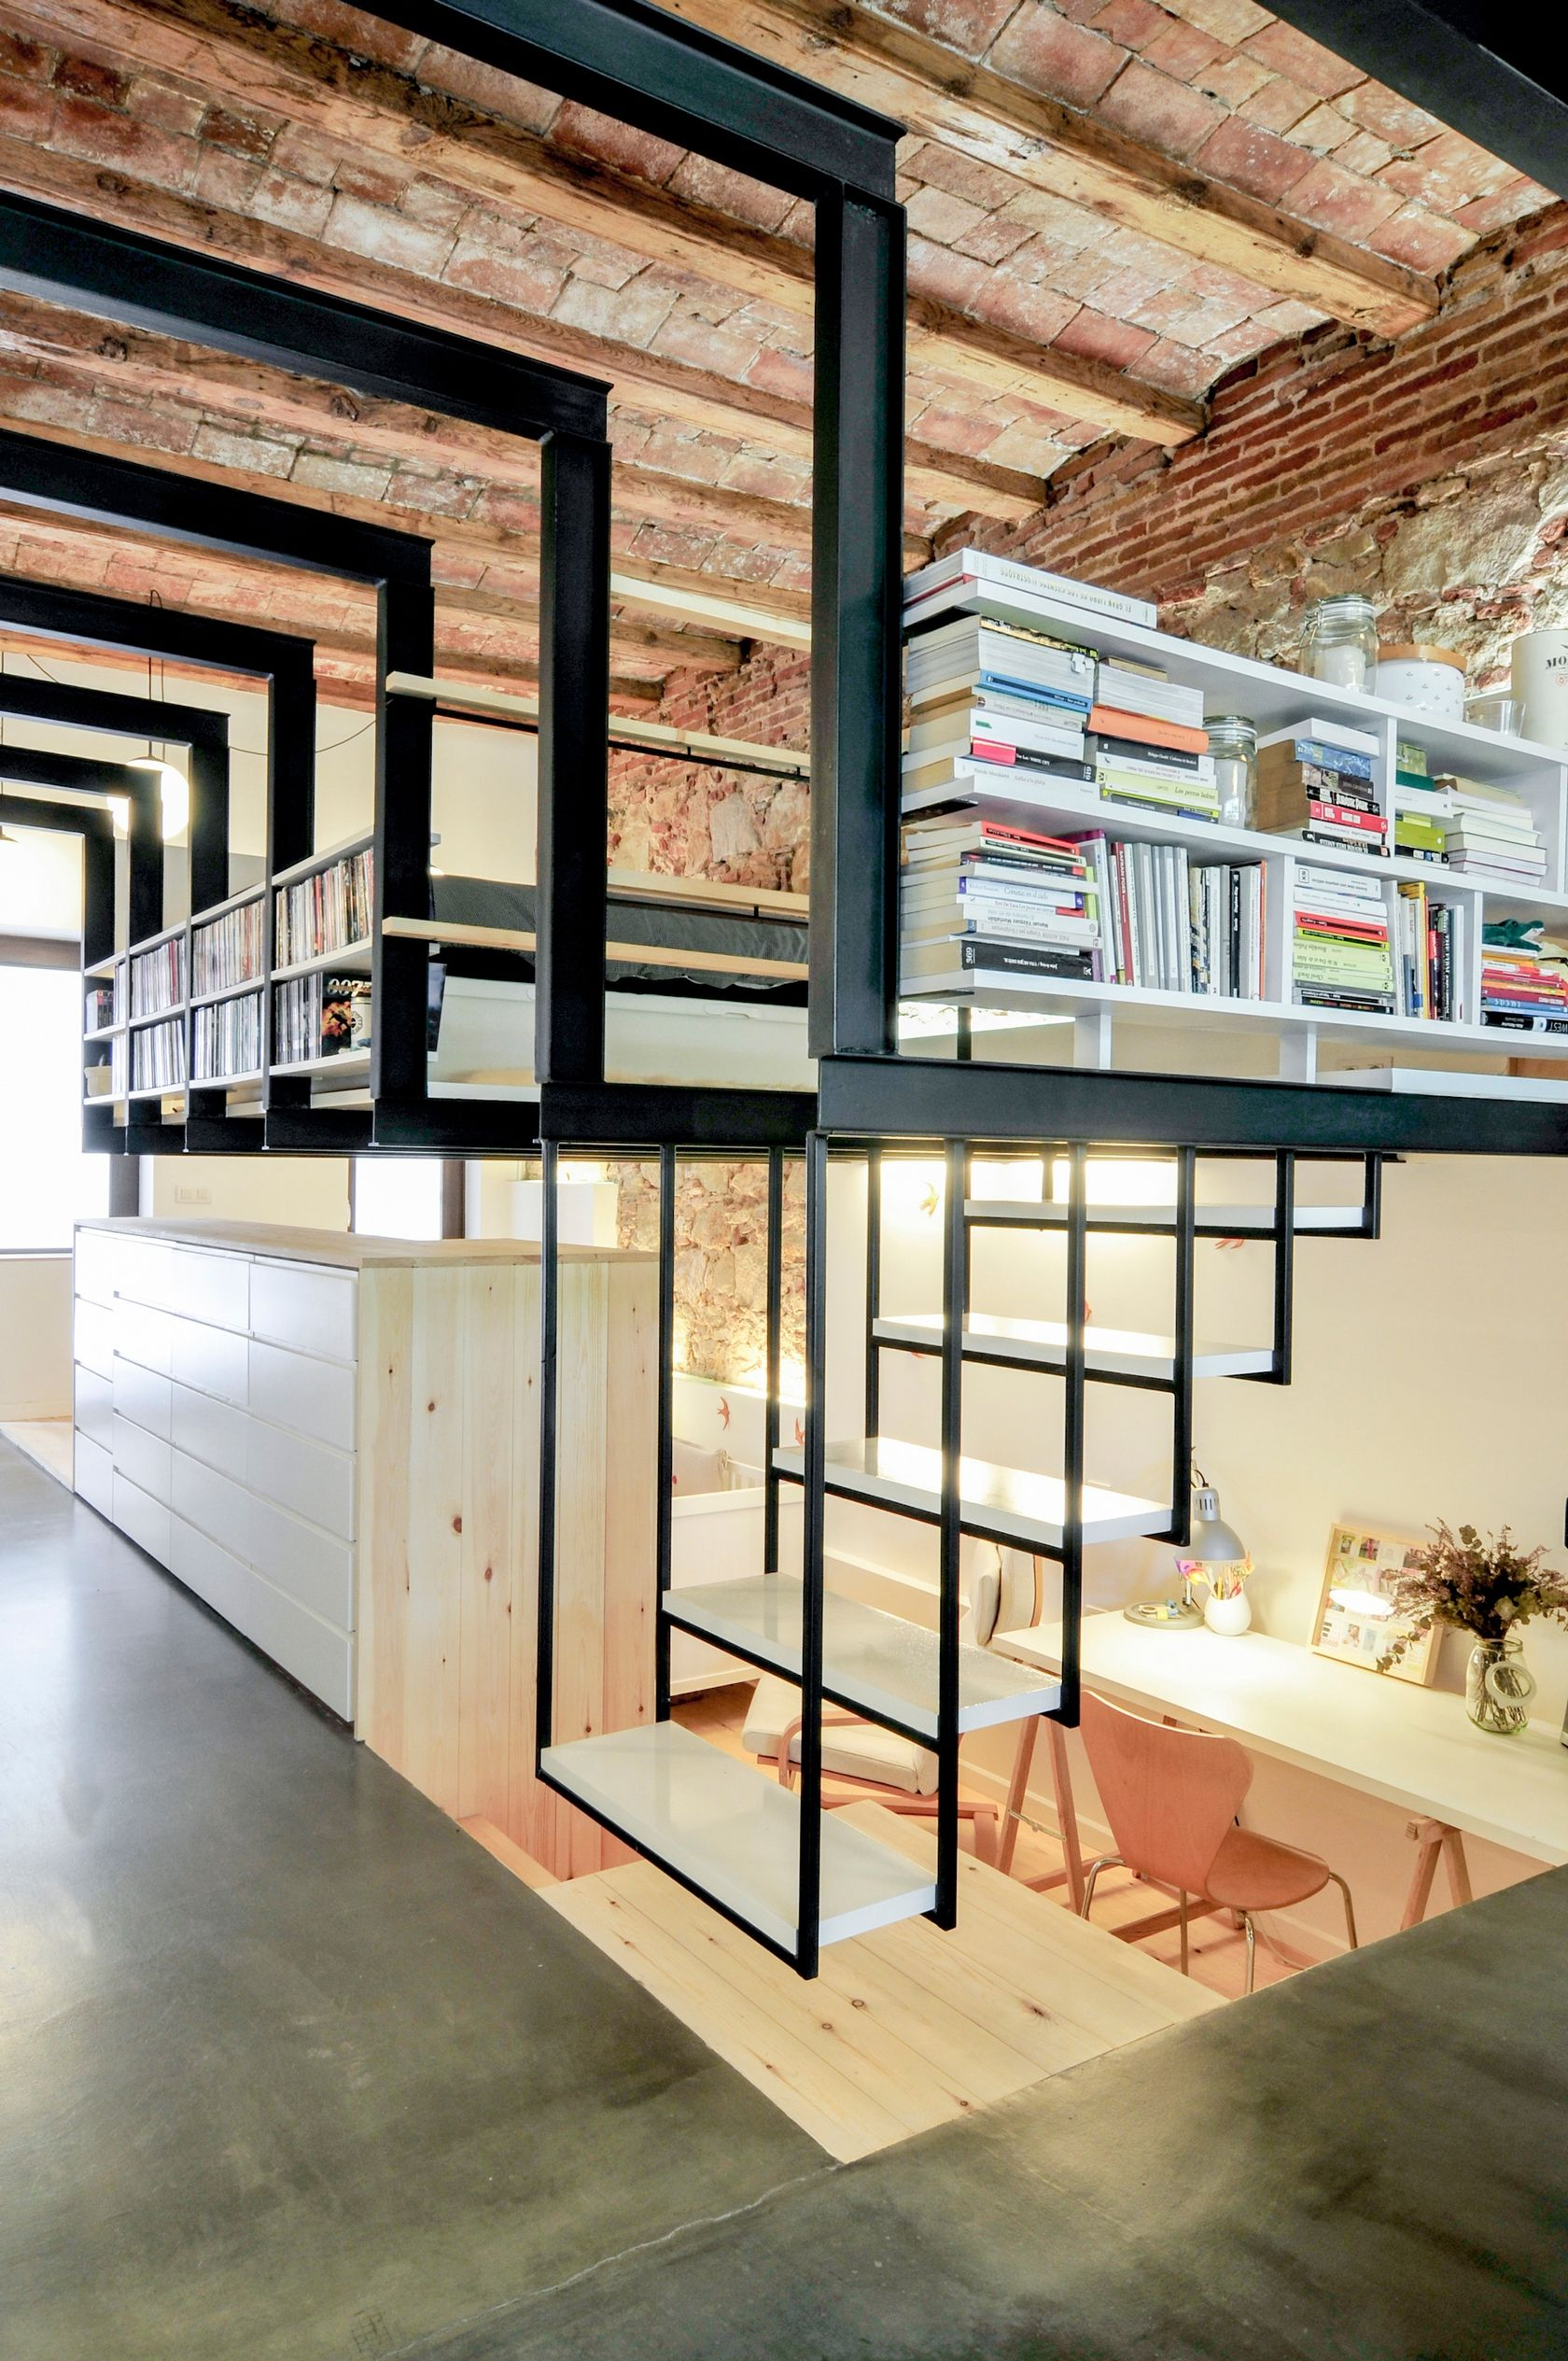 Patio-House In Gracia Barcelona, Spain